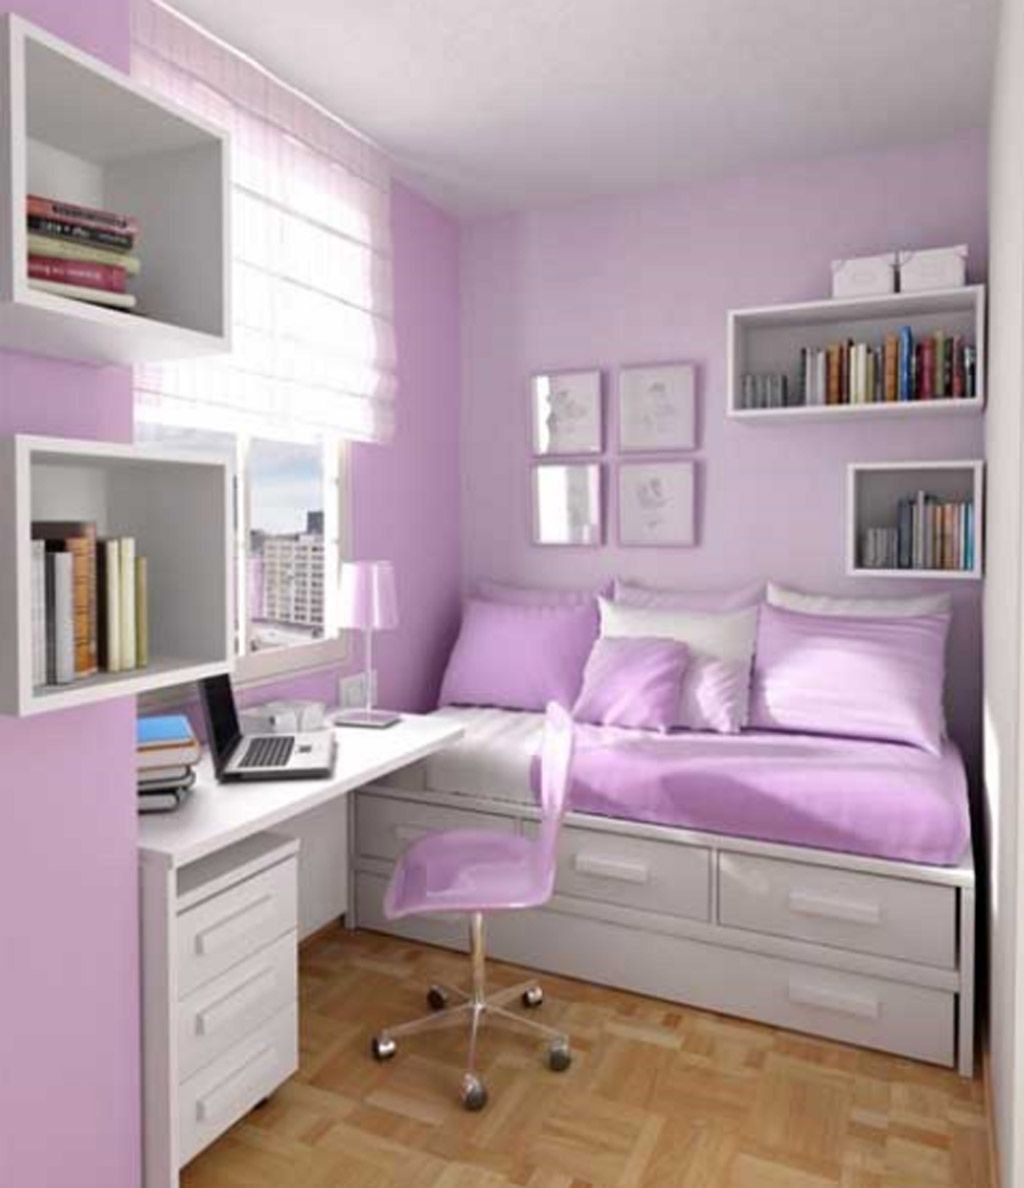 Medium Of Pics Of Teenage Bedrooms